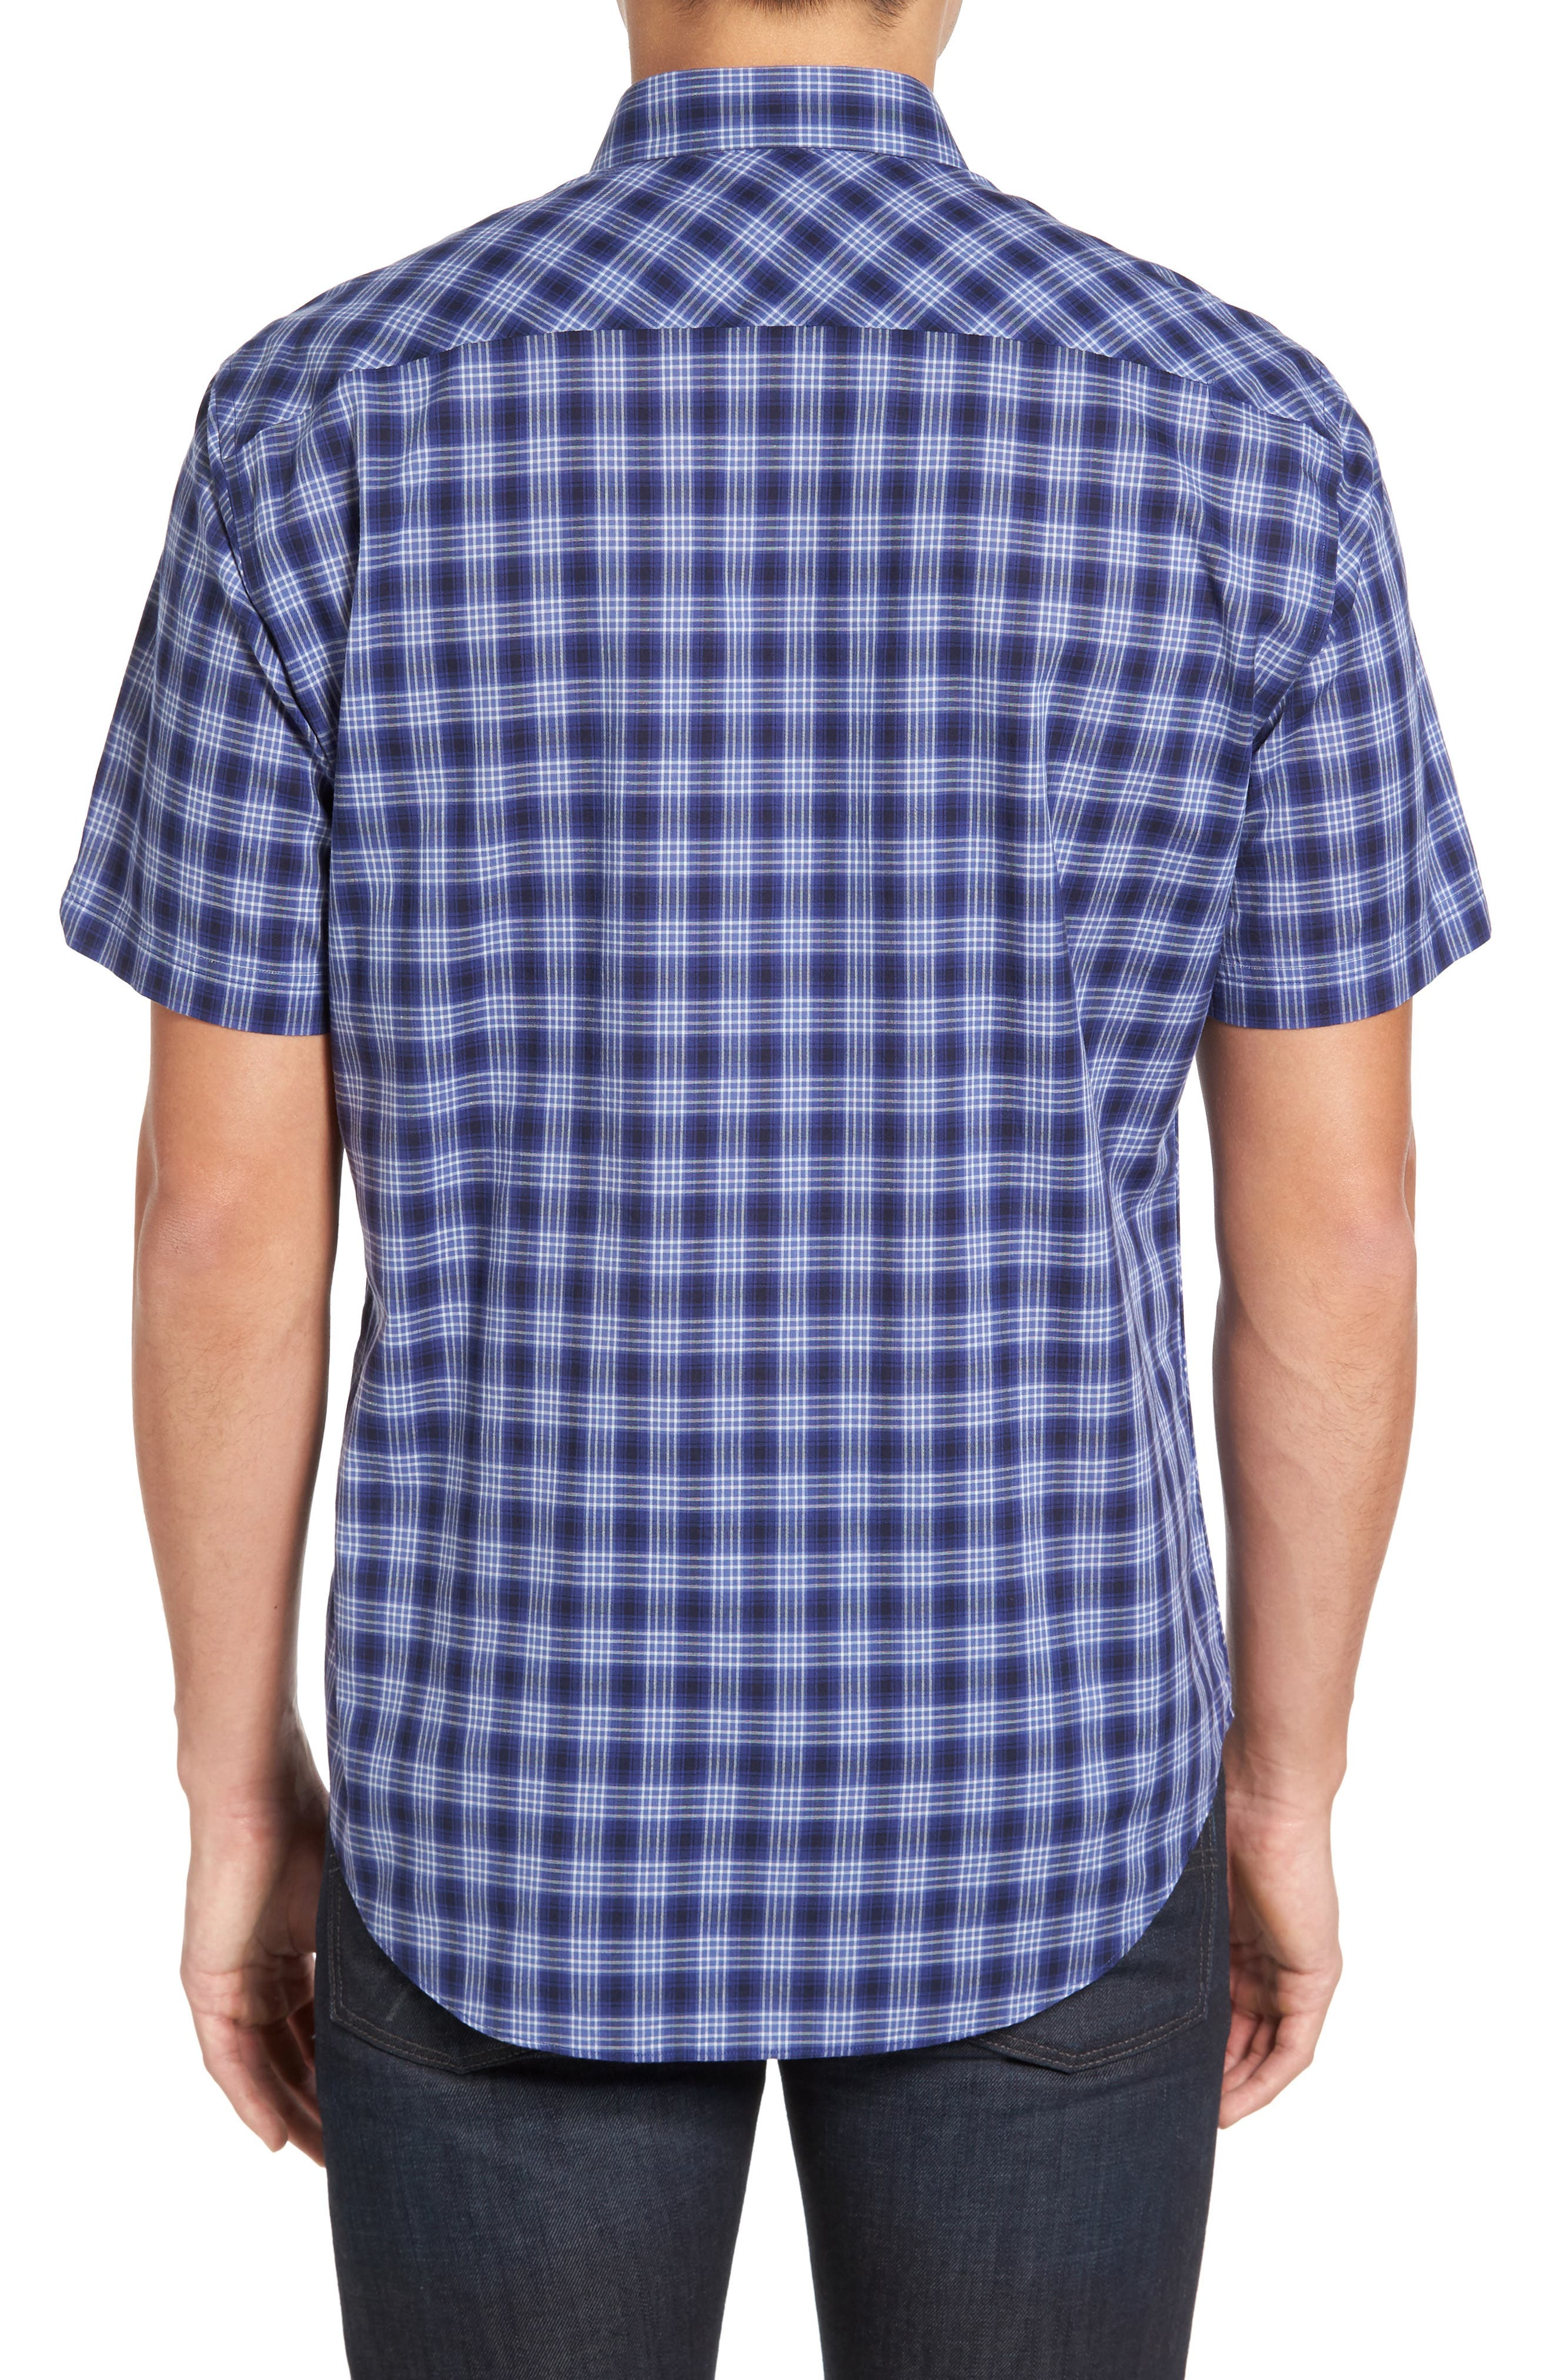 ZACHARY PRELL,                             Medina Slim Fit Plaid Sport Shirt,                             Alternate thumbnail 2, color,                             421